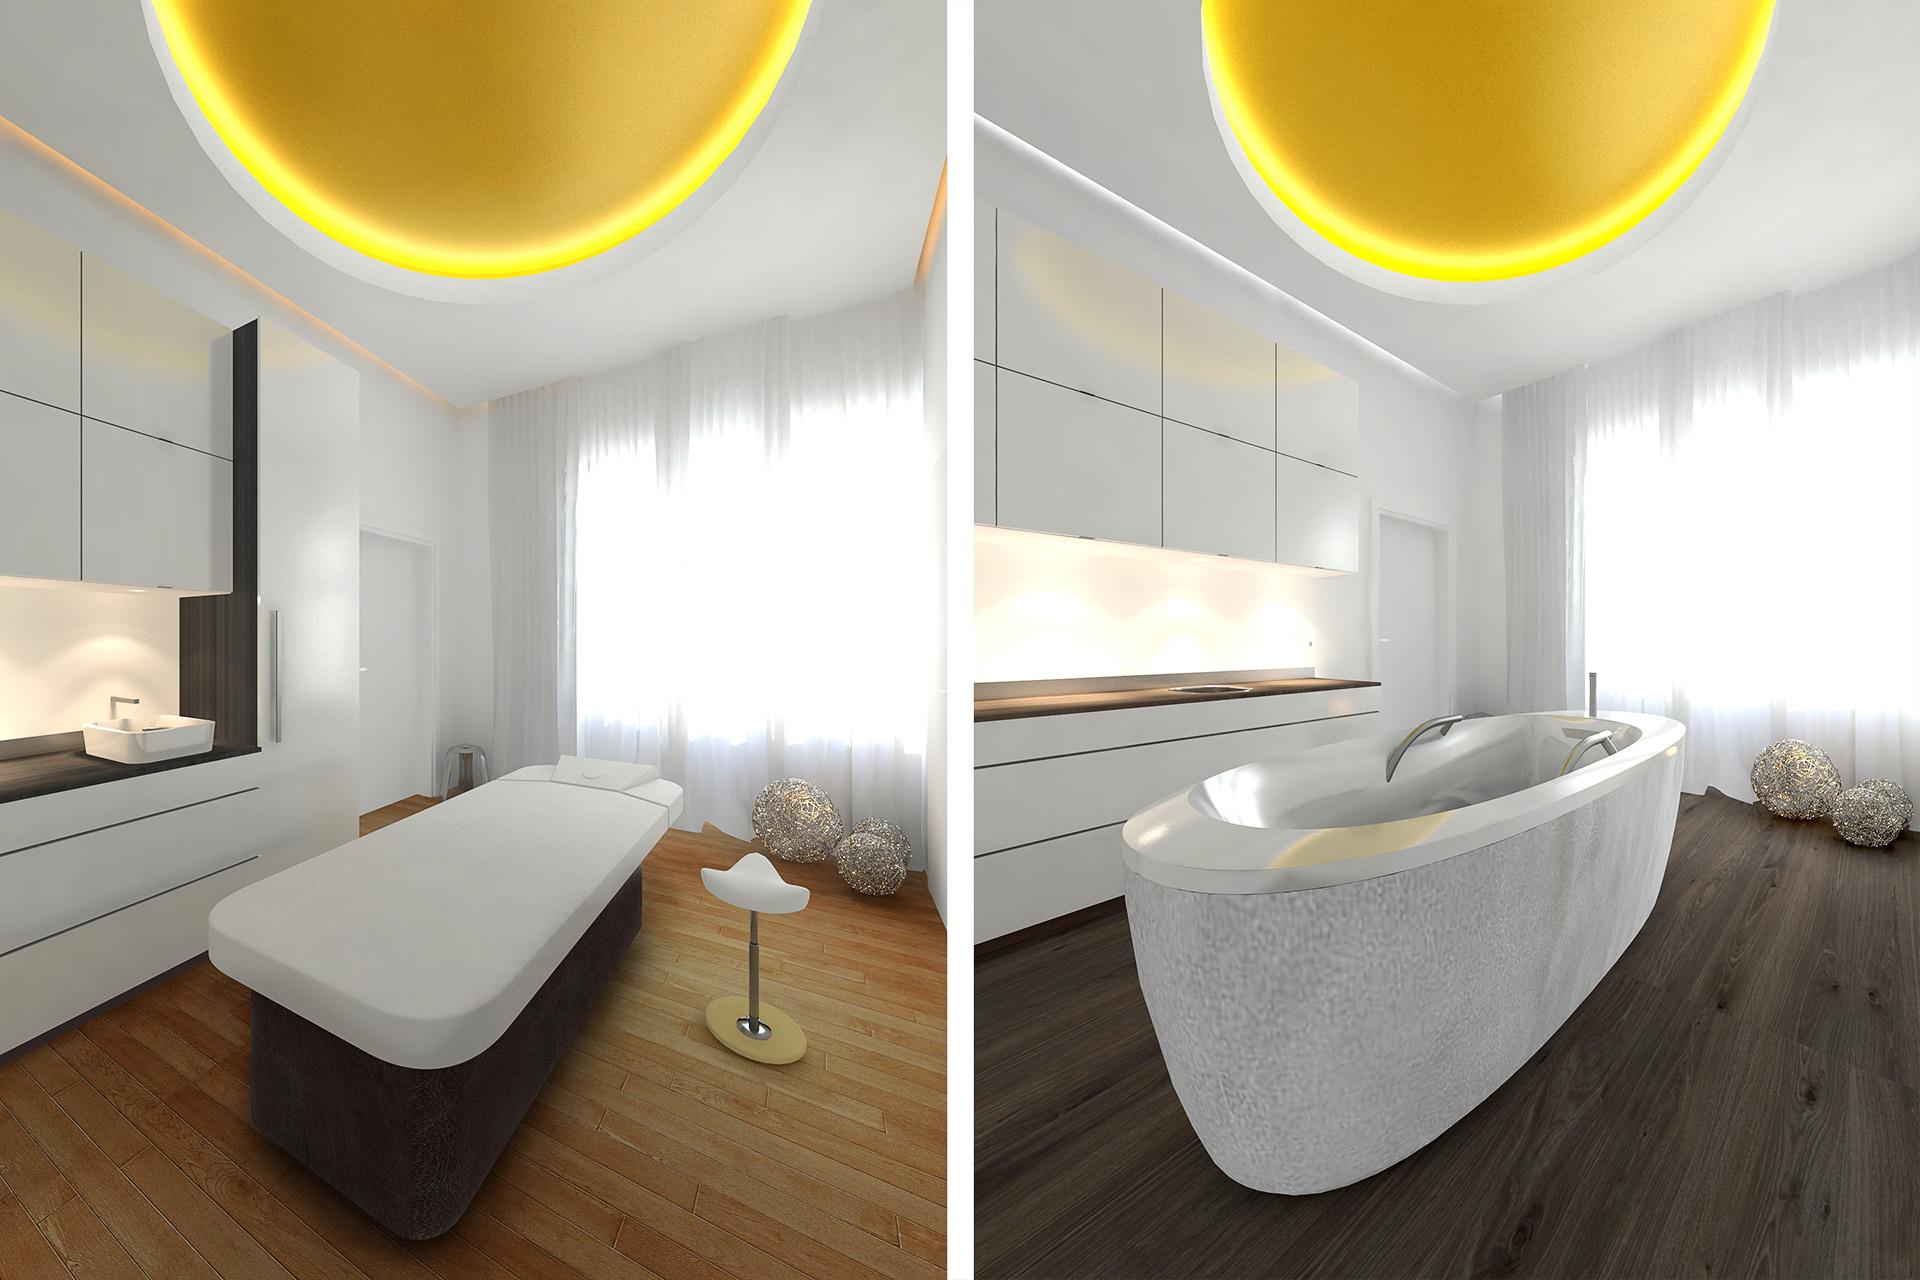 Produkt Visualisierung Medical Spa